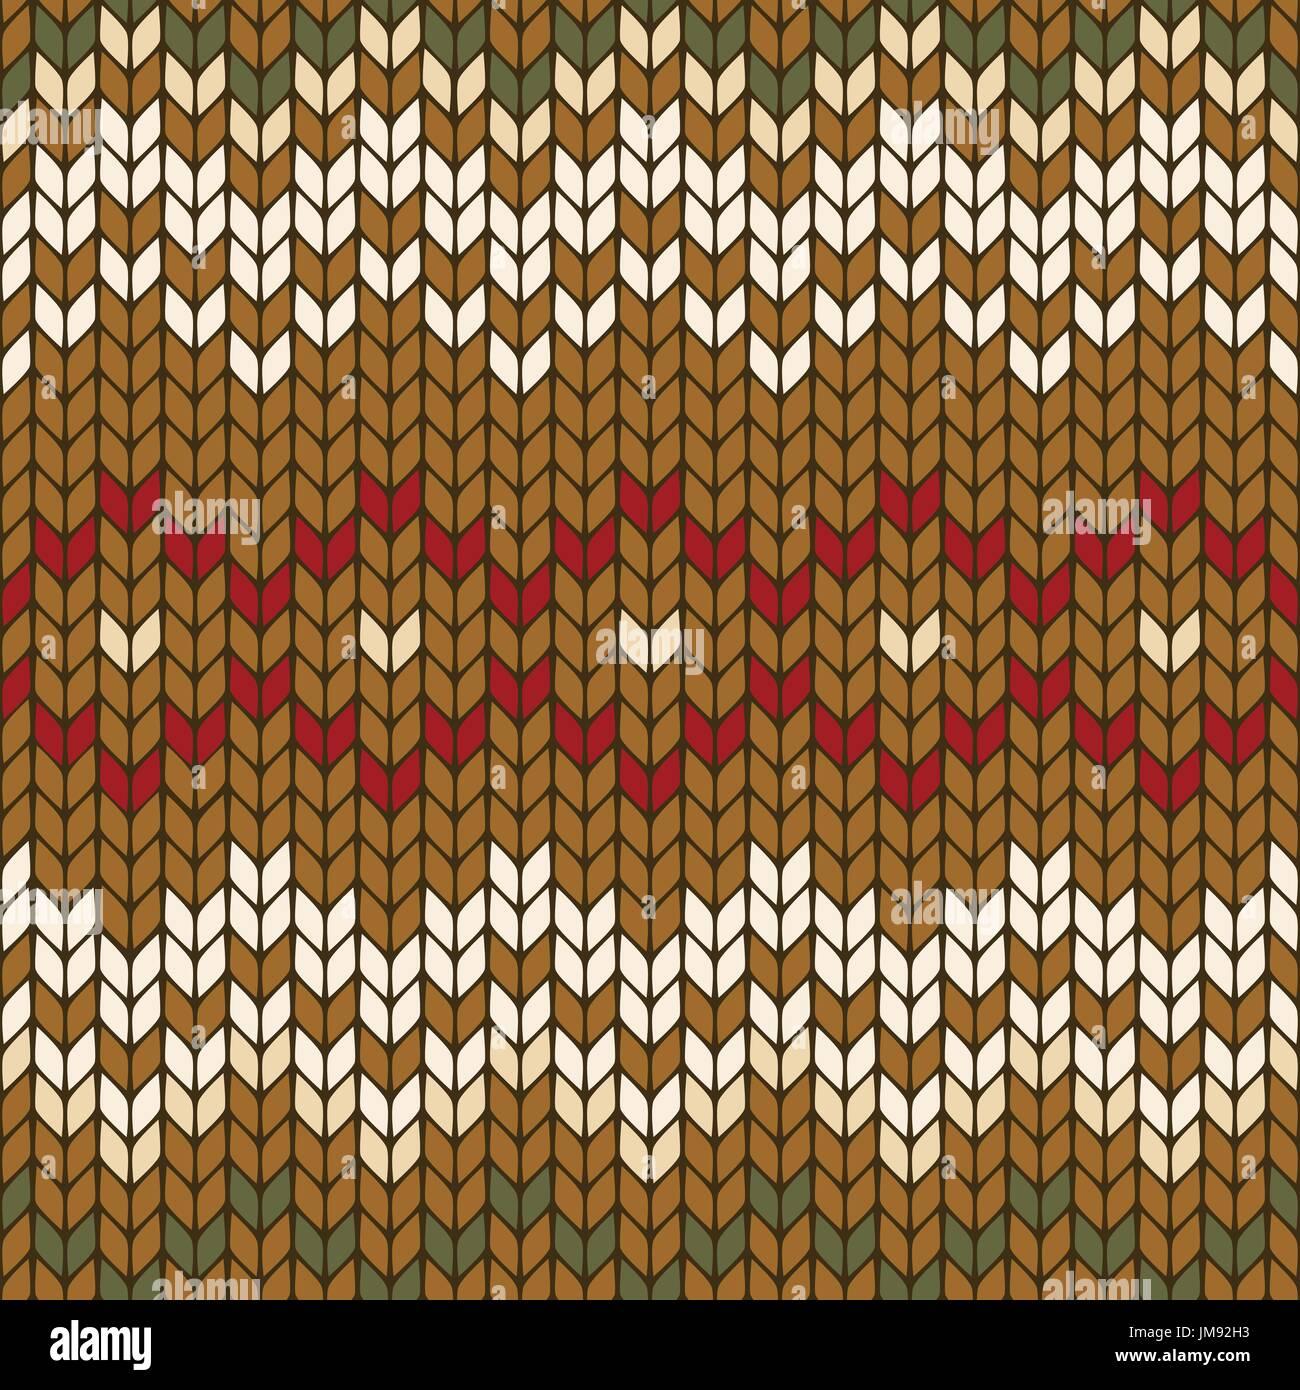 335d27ea3 Seamless knitted geometric pattern